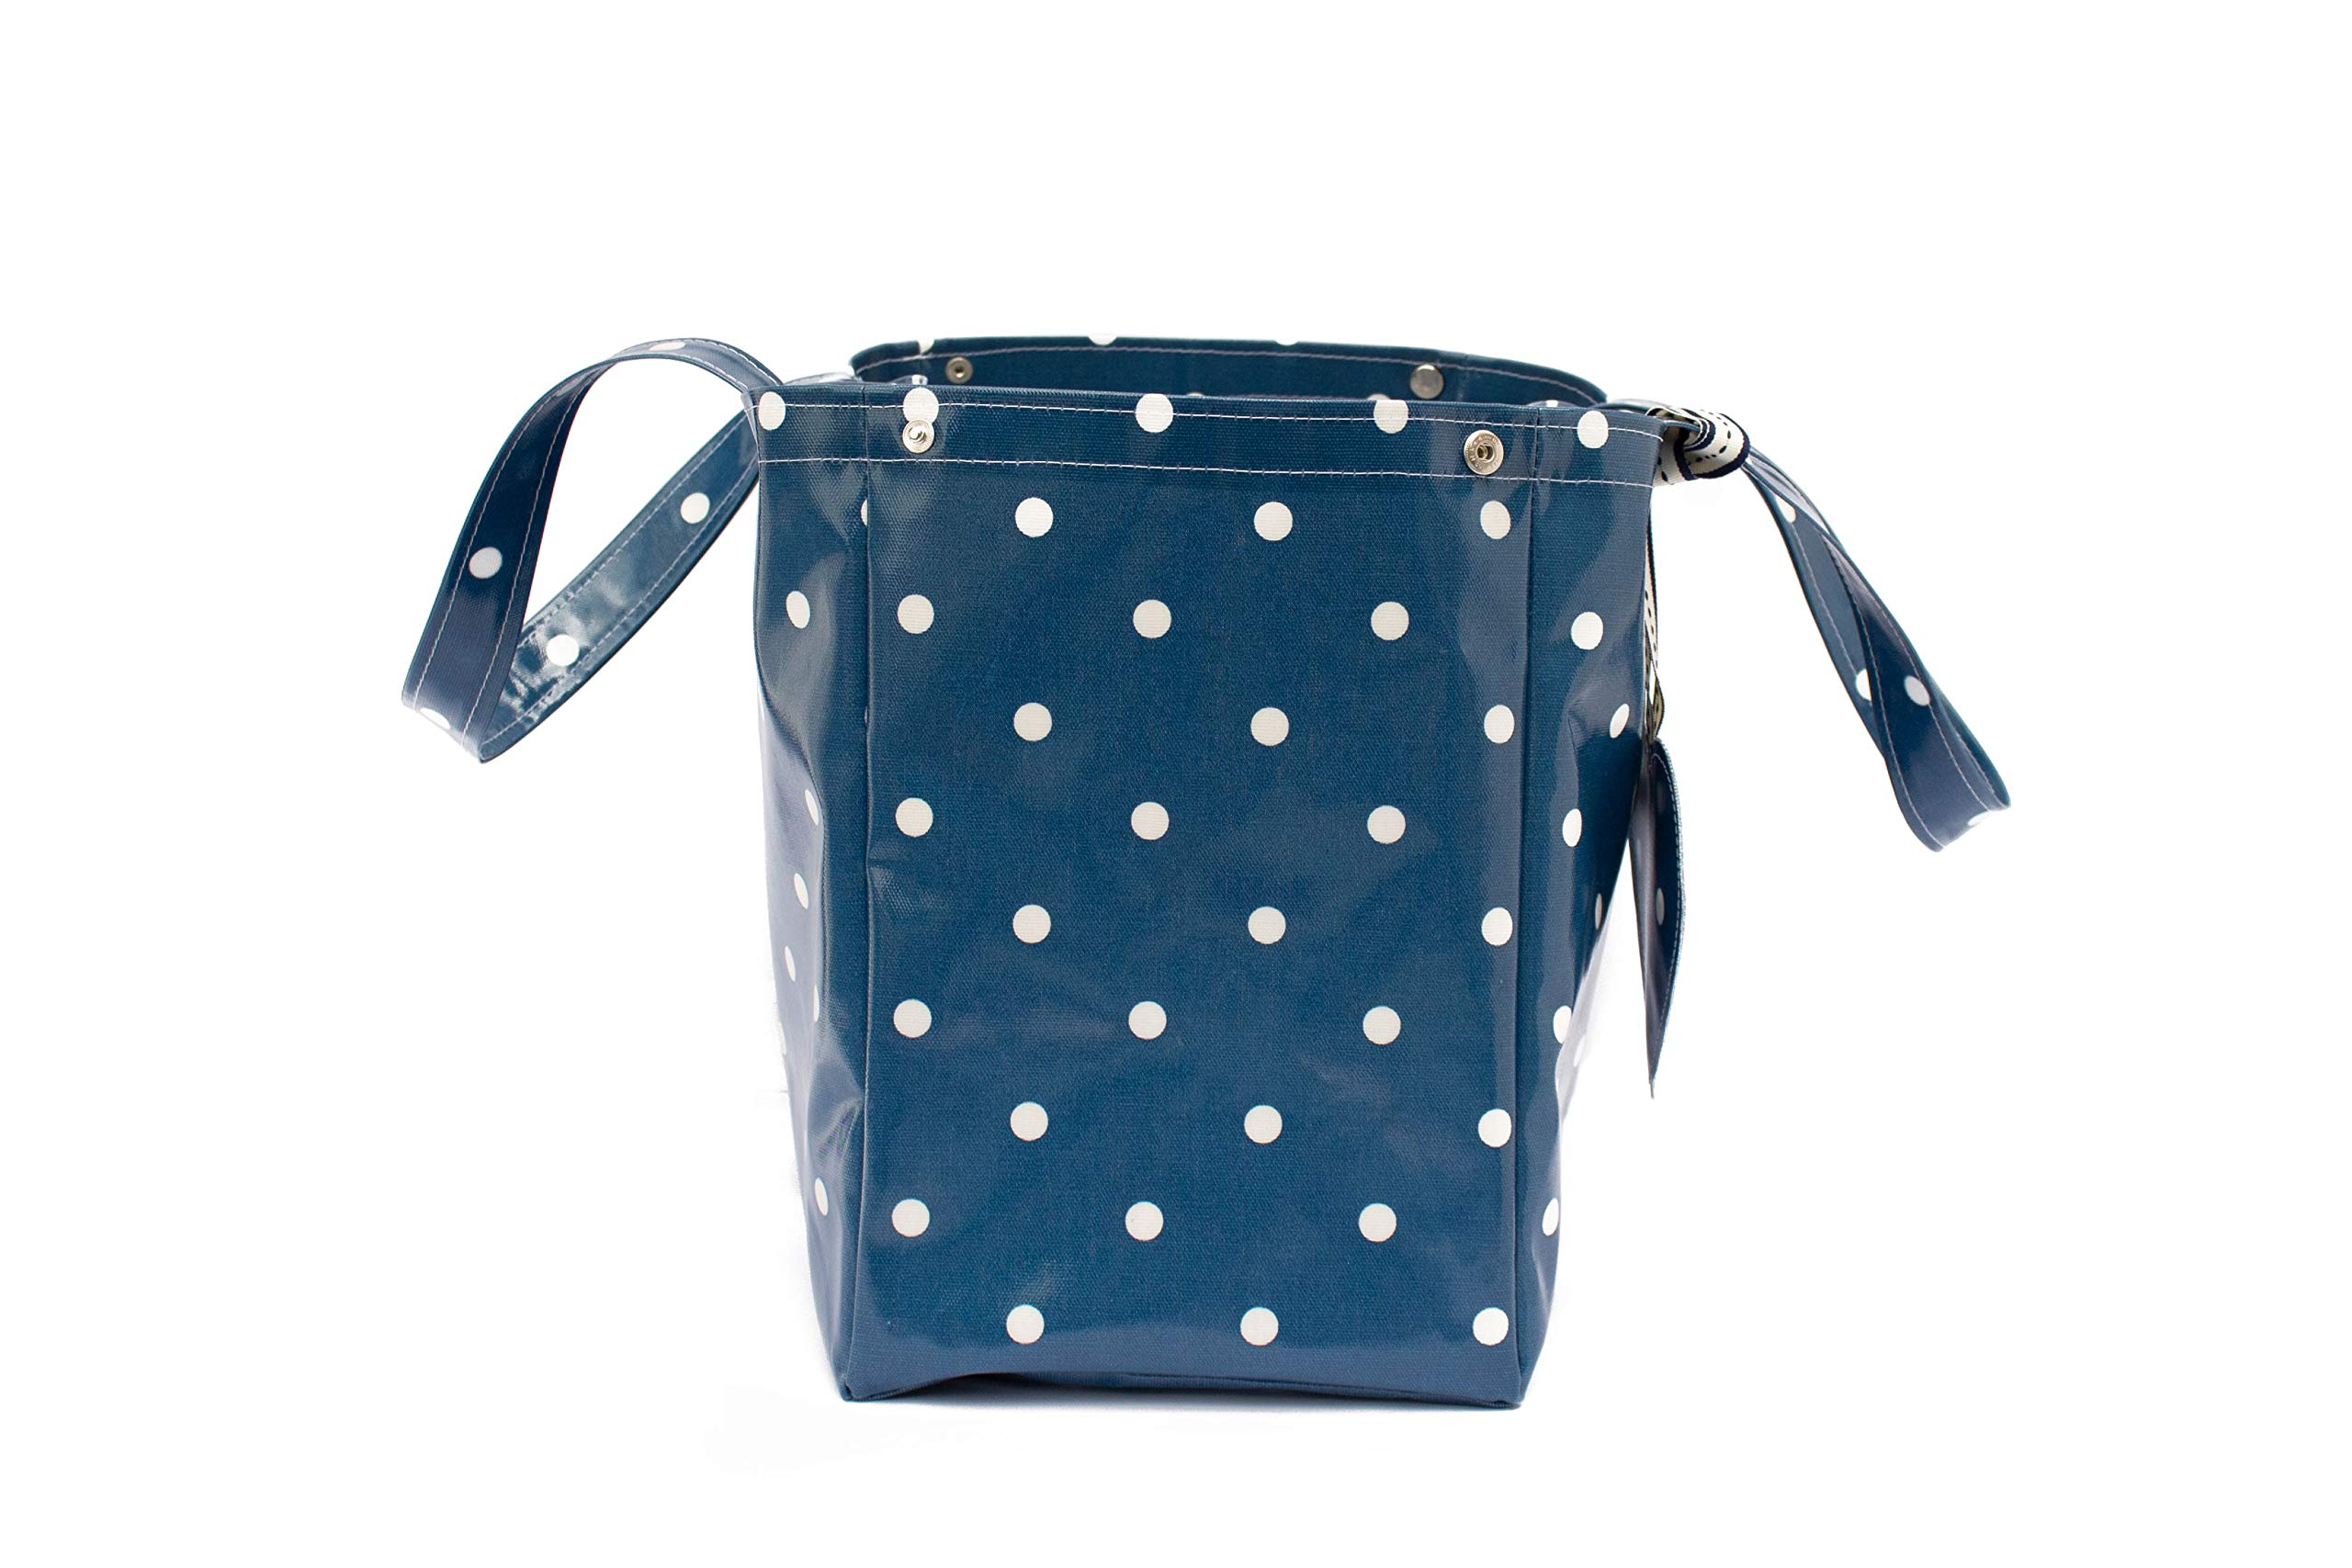 Blue Polka Dot Market Tote Bag Purse Fashion Gift for Her - handmade-bags